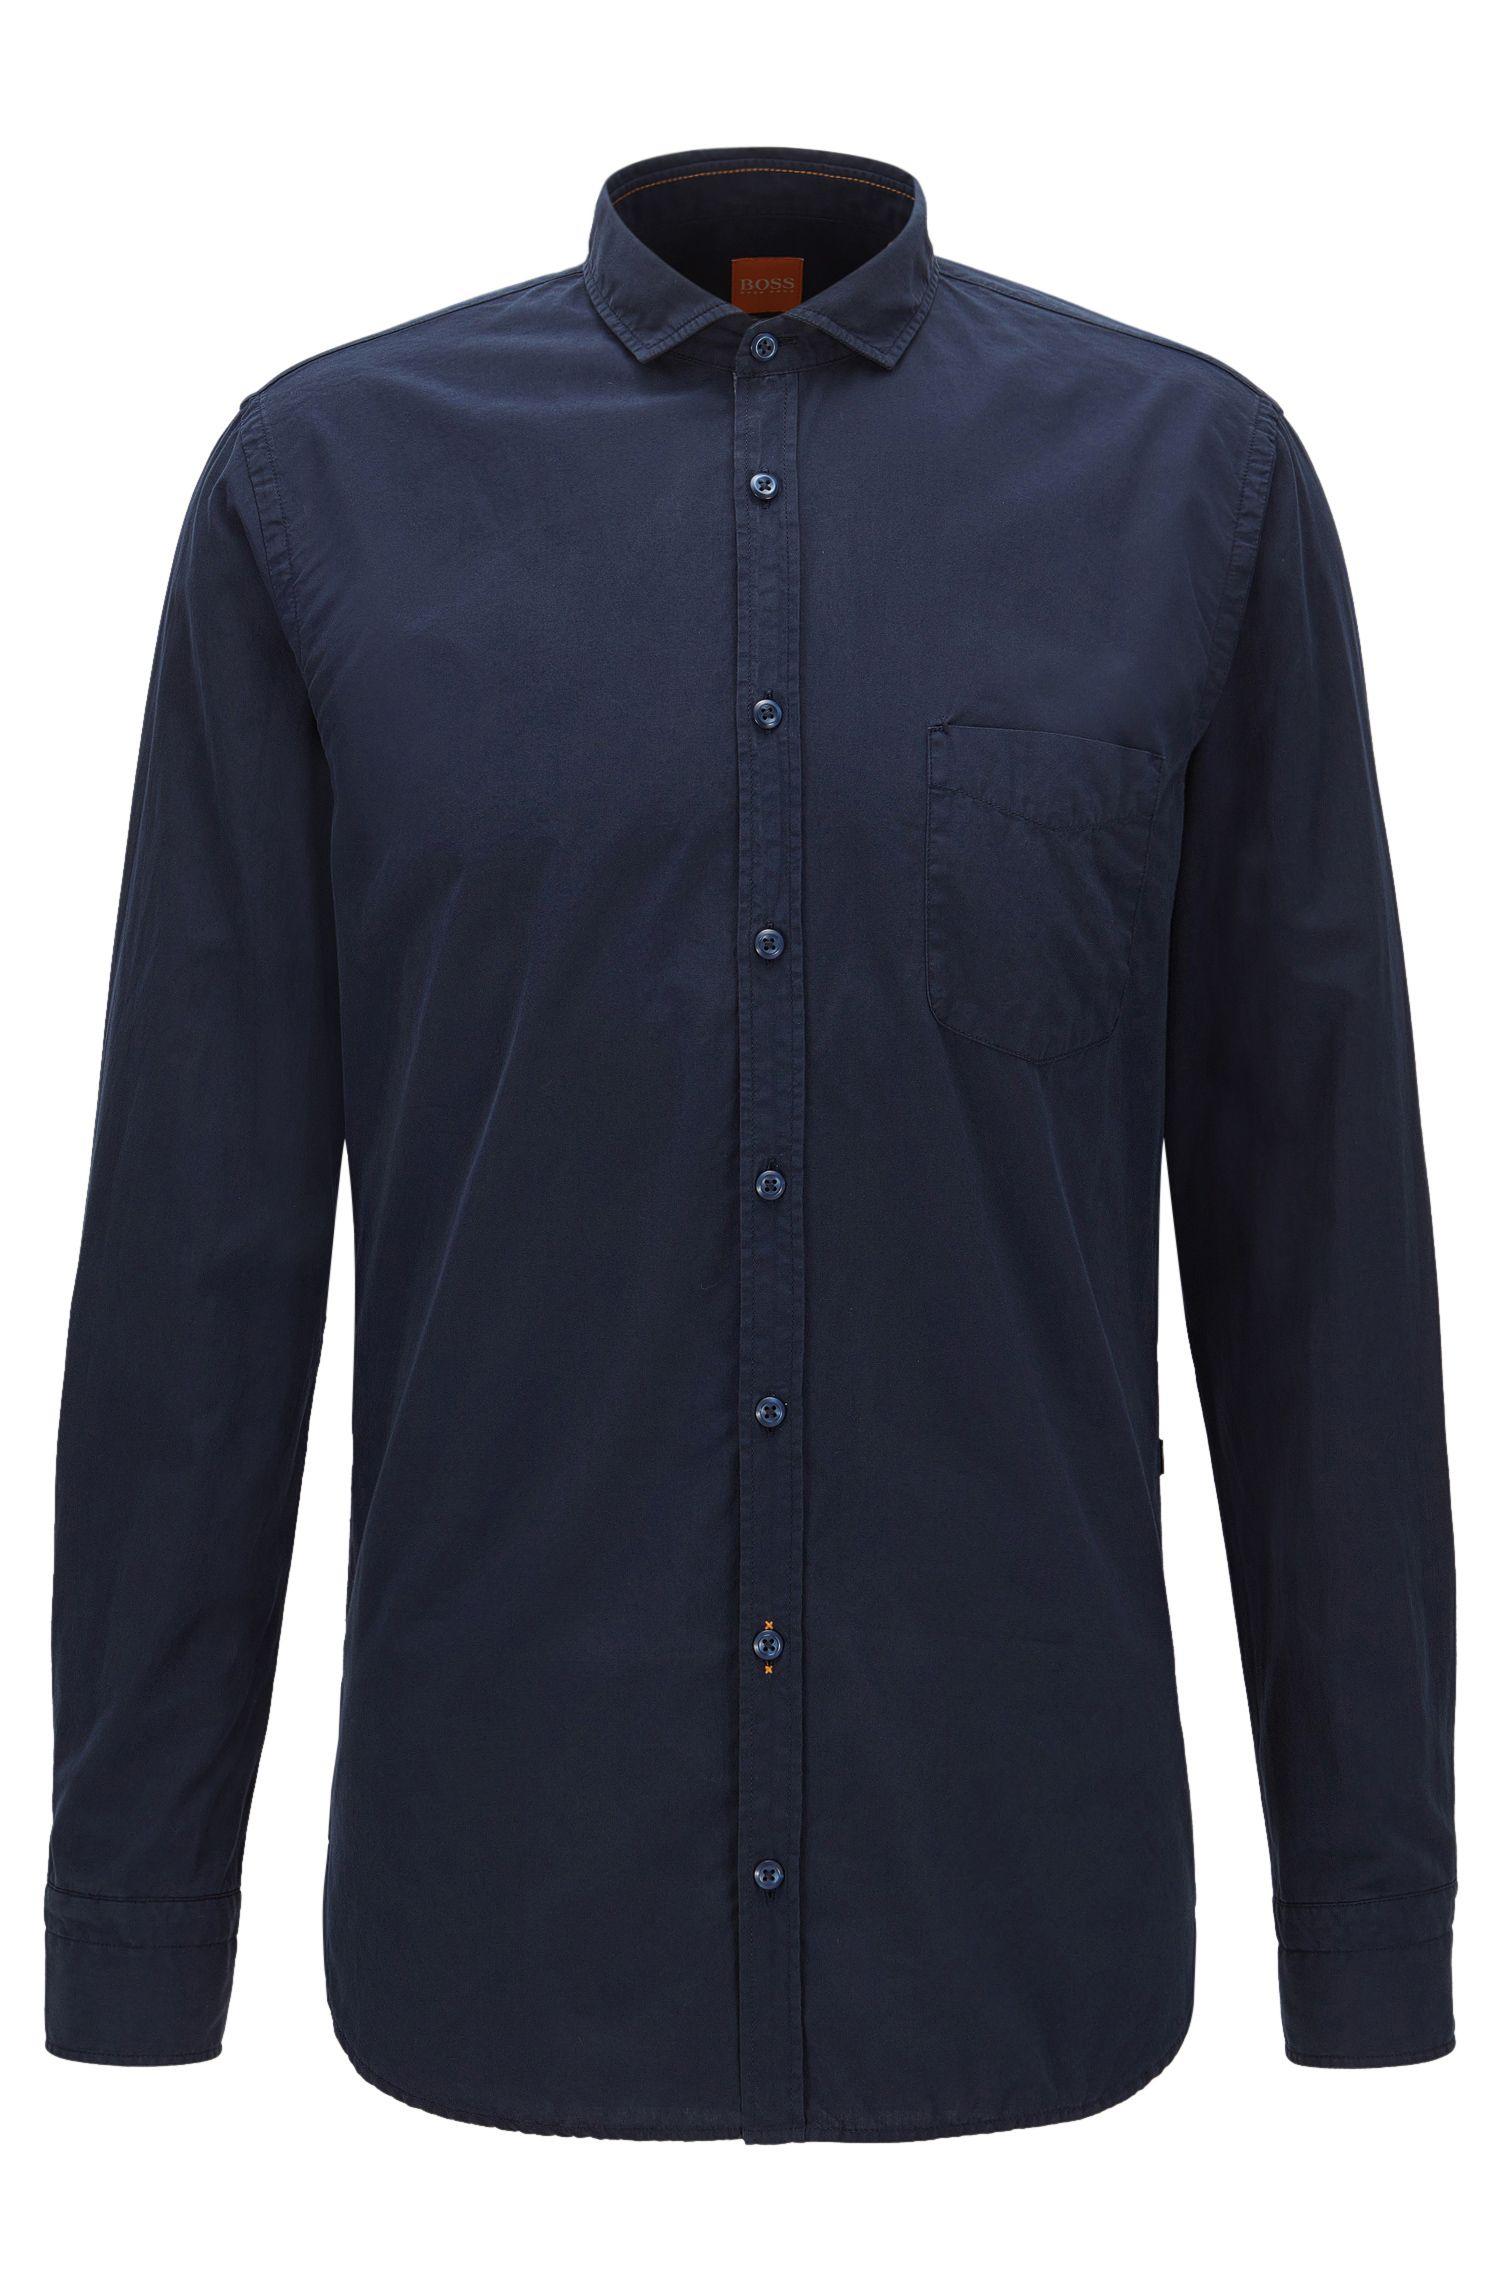 Cotton Poplin Button Down Shirt, Slim Fit | Cattitude Short